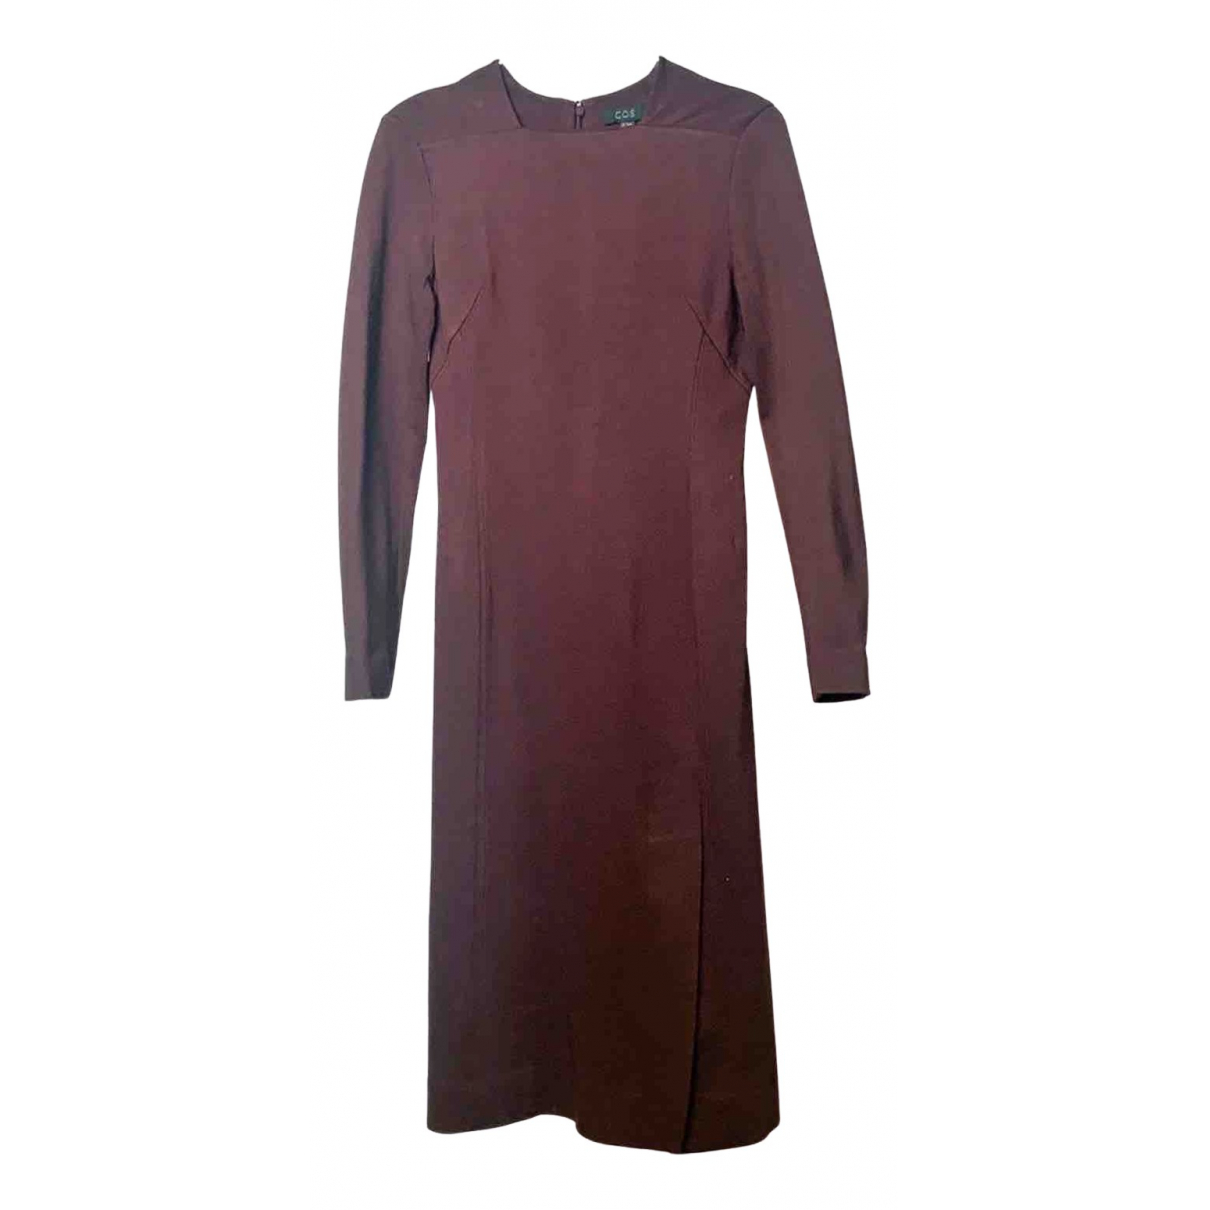 Cos \N Burgundy dress for Women 34 FR